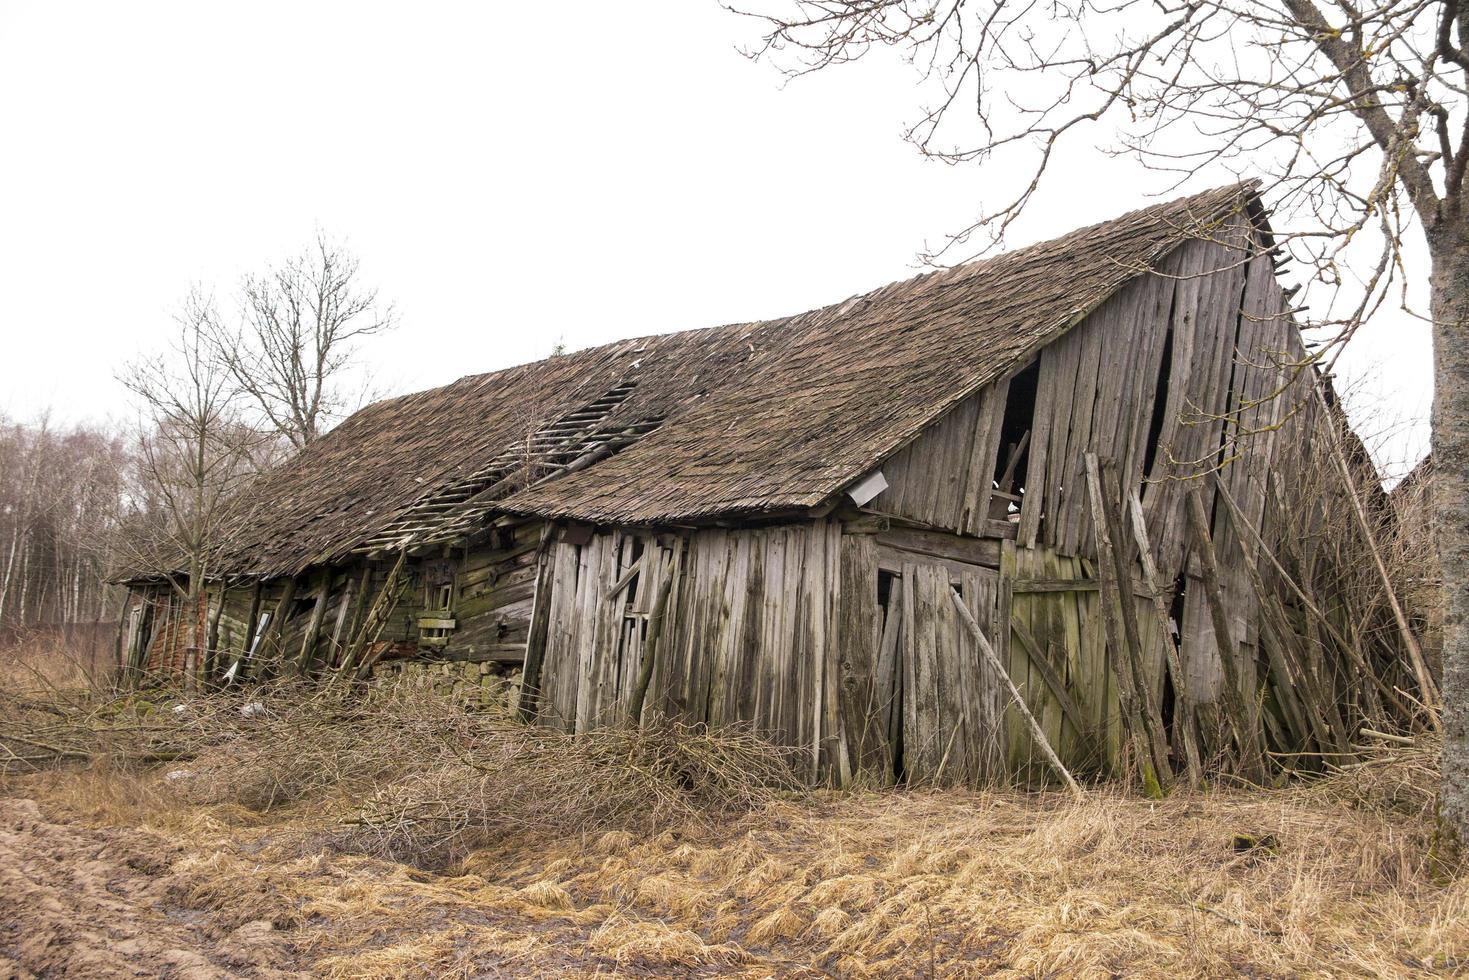 Abandoned old barn photo